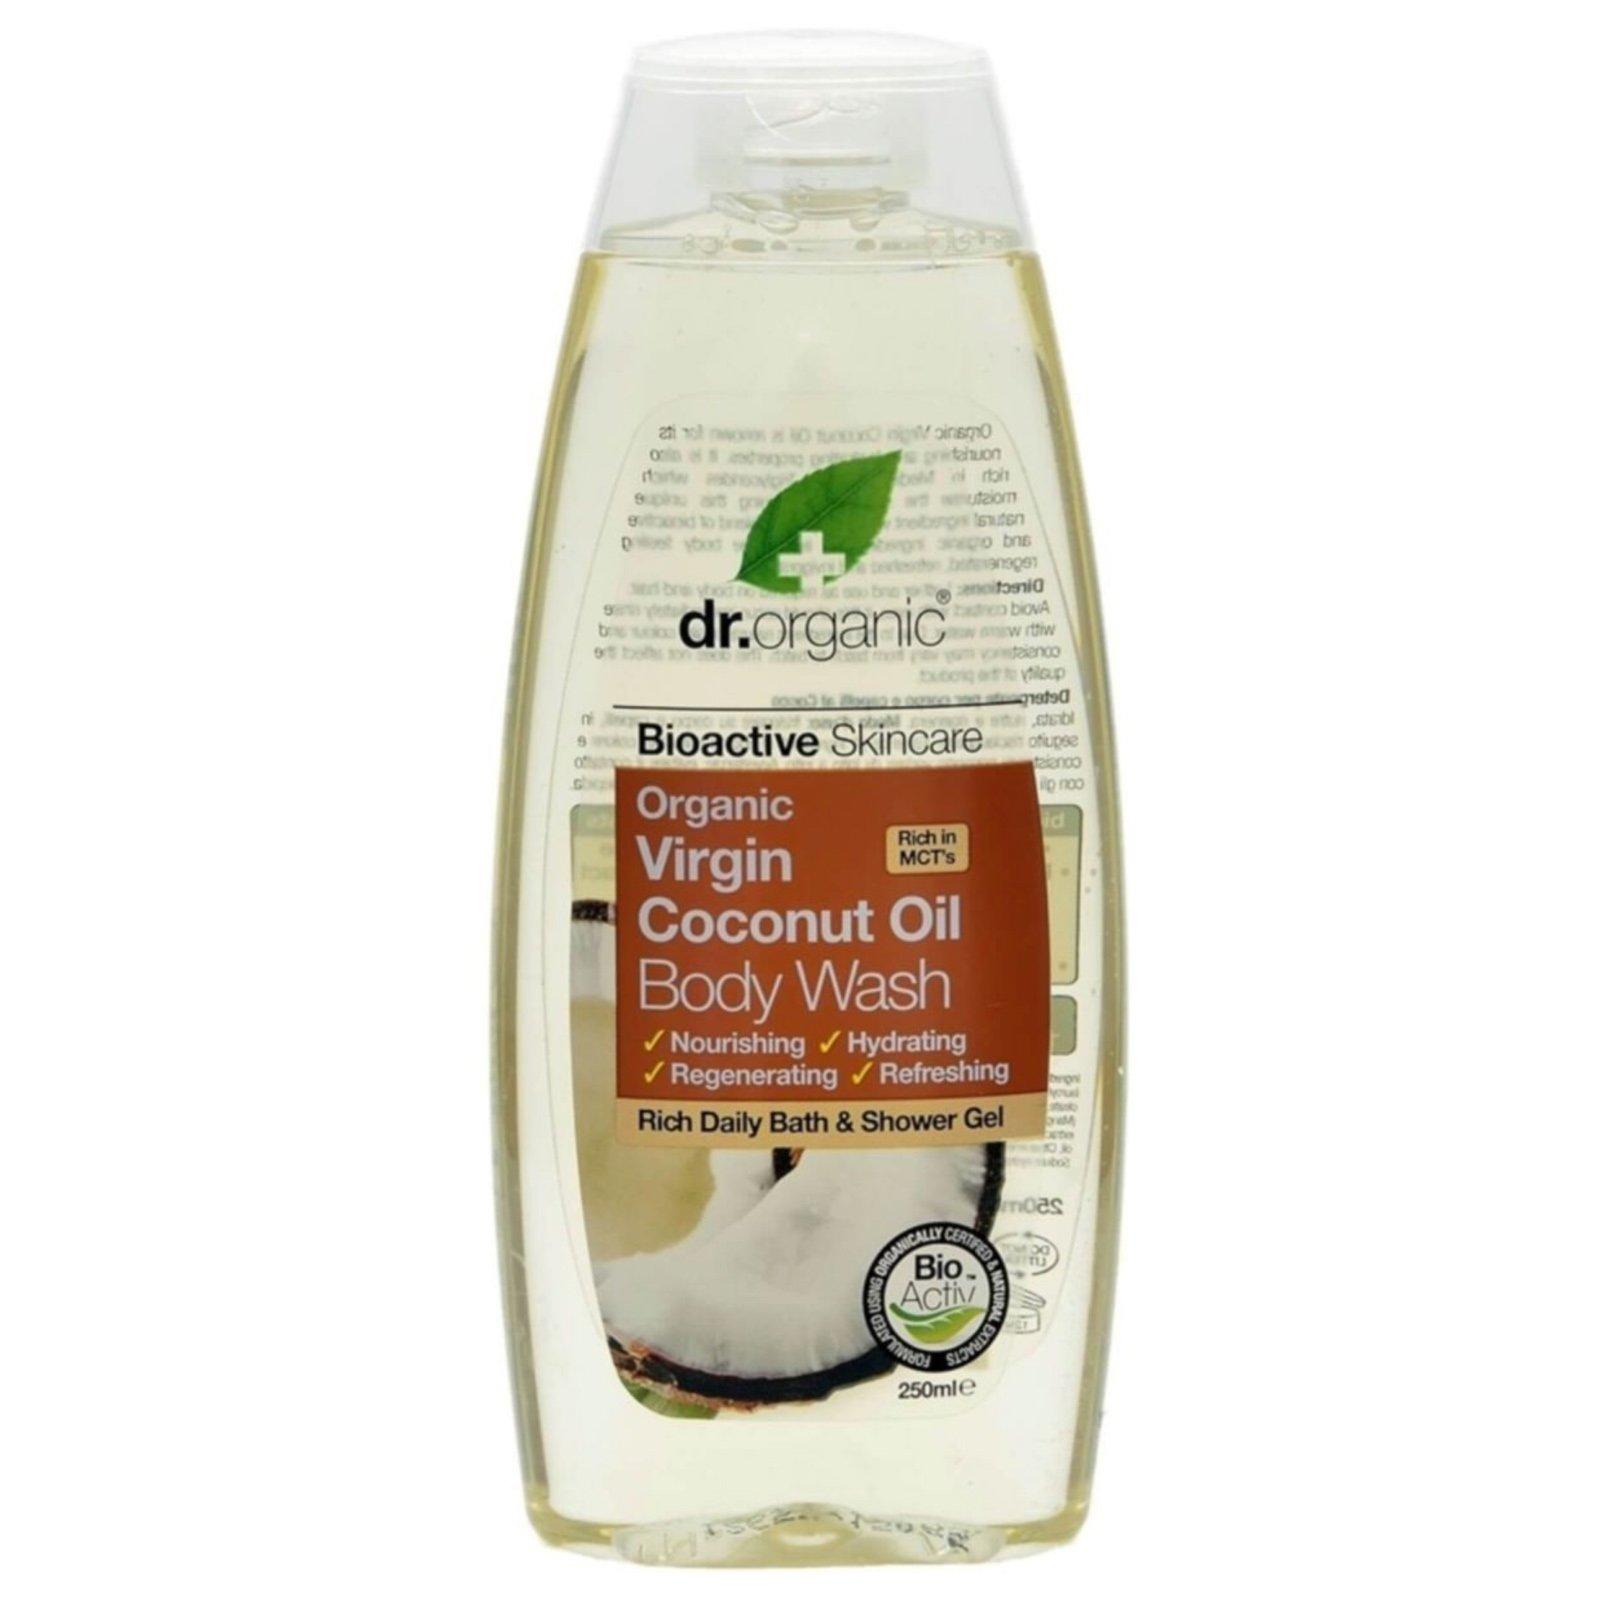 Dr Organic Organic Virgin Coconut Oil Body Wash Αφρόλουτρο με Βιολογικό Έλαιο Καρύδας 250ml